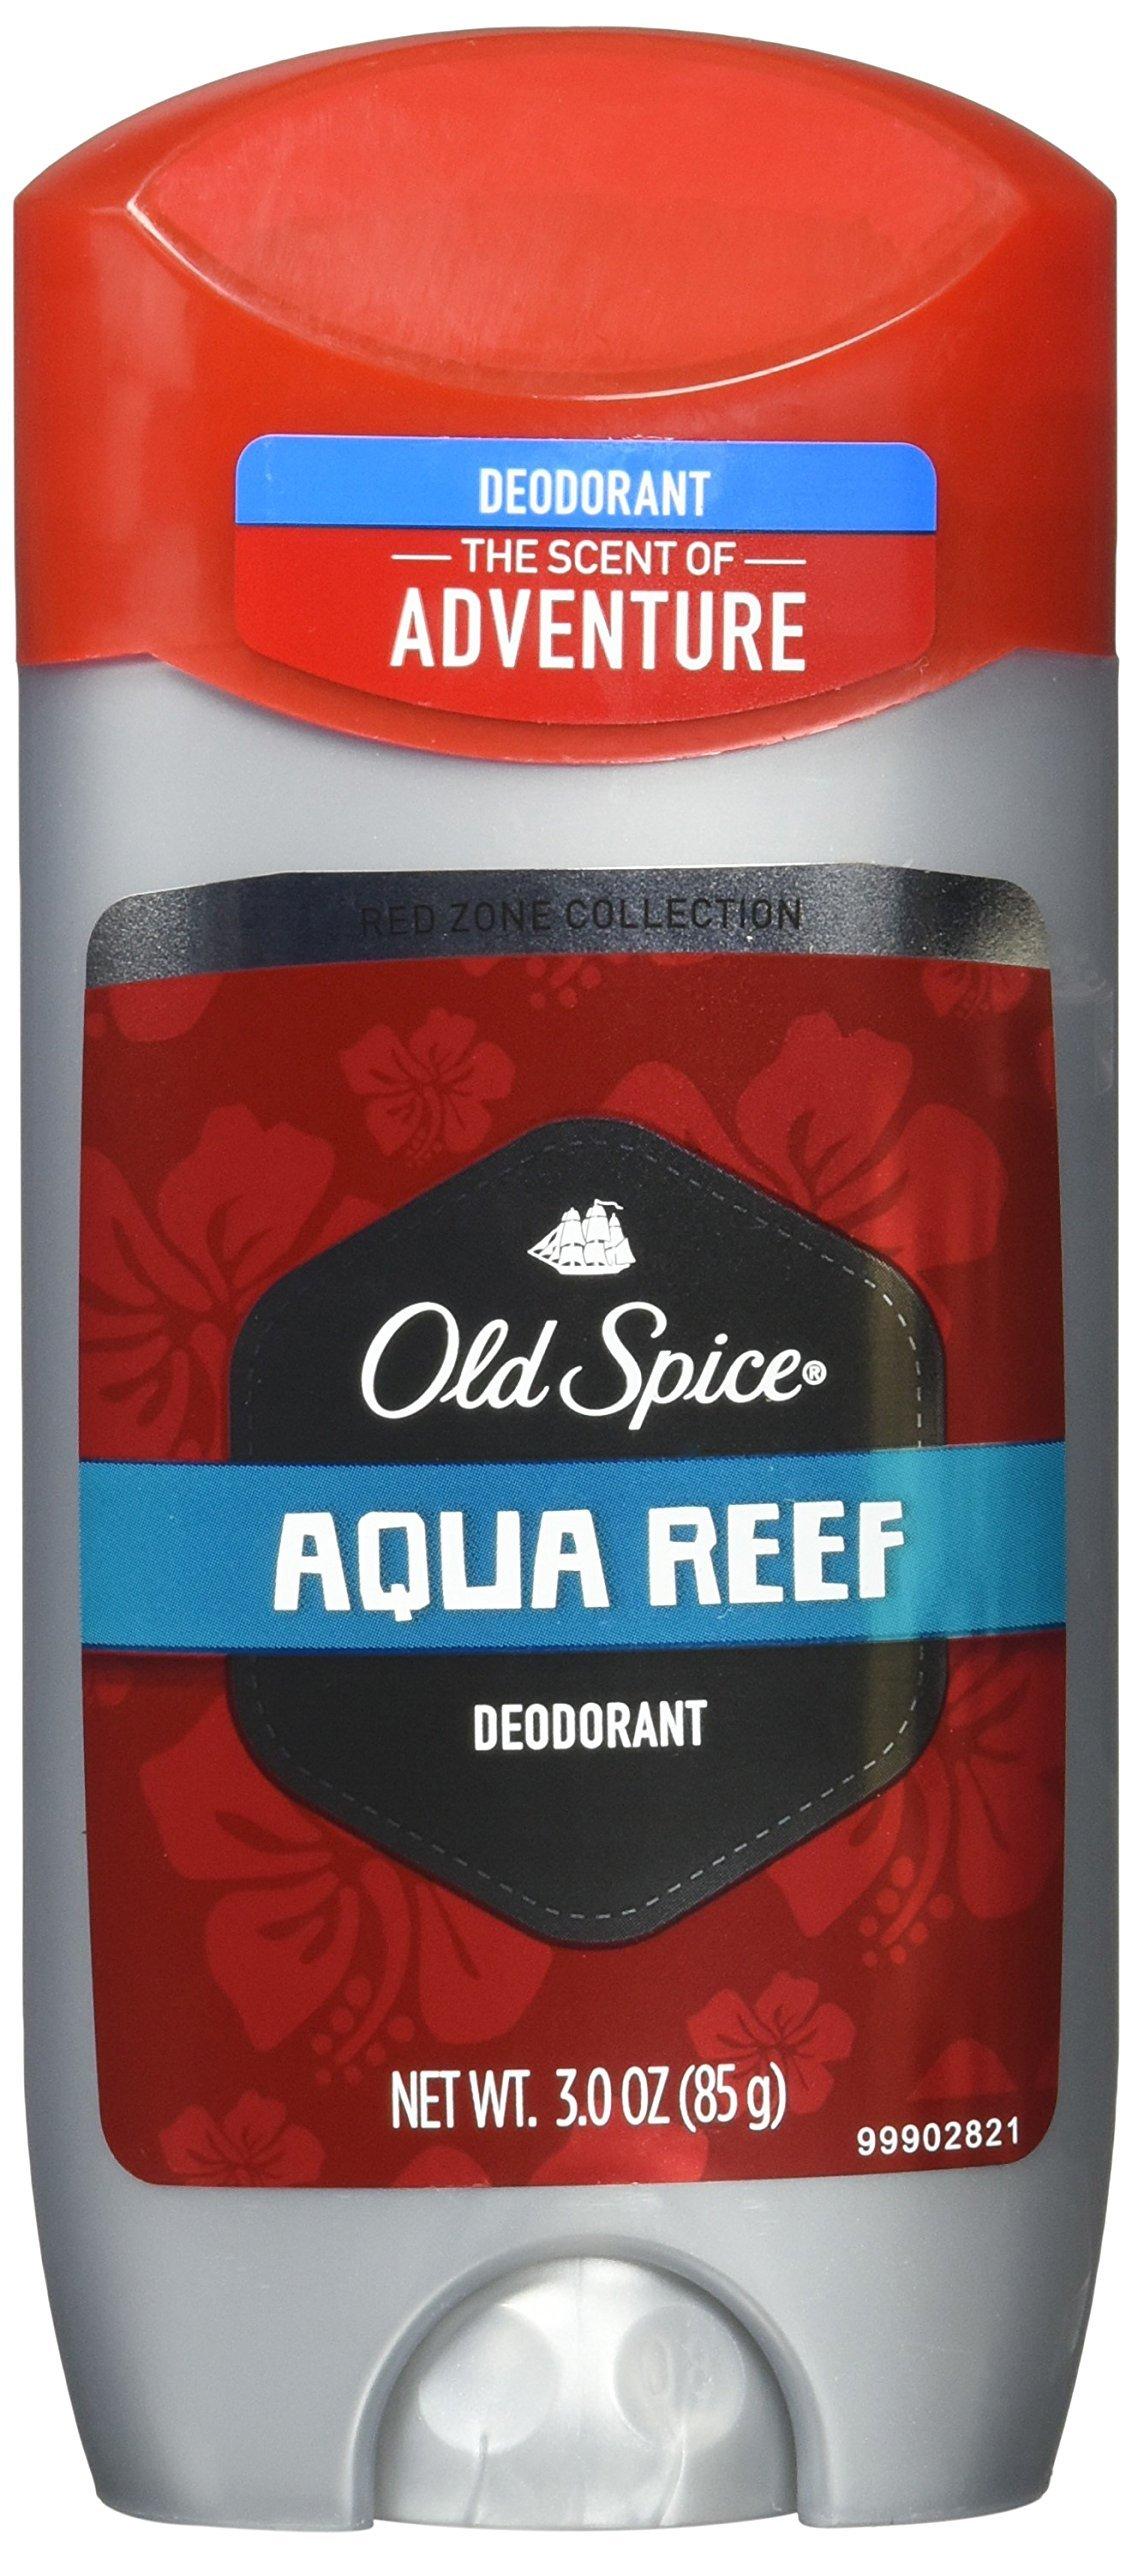 Old Spice Red Zone Deodorant, Aqua Reef - 3 oz - 2 pk